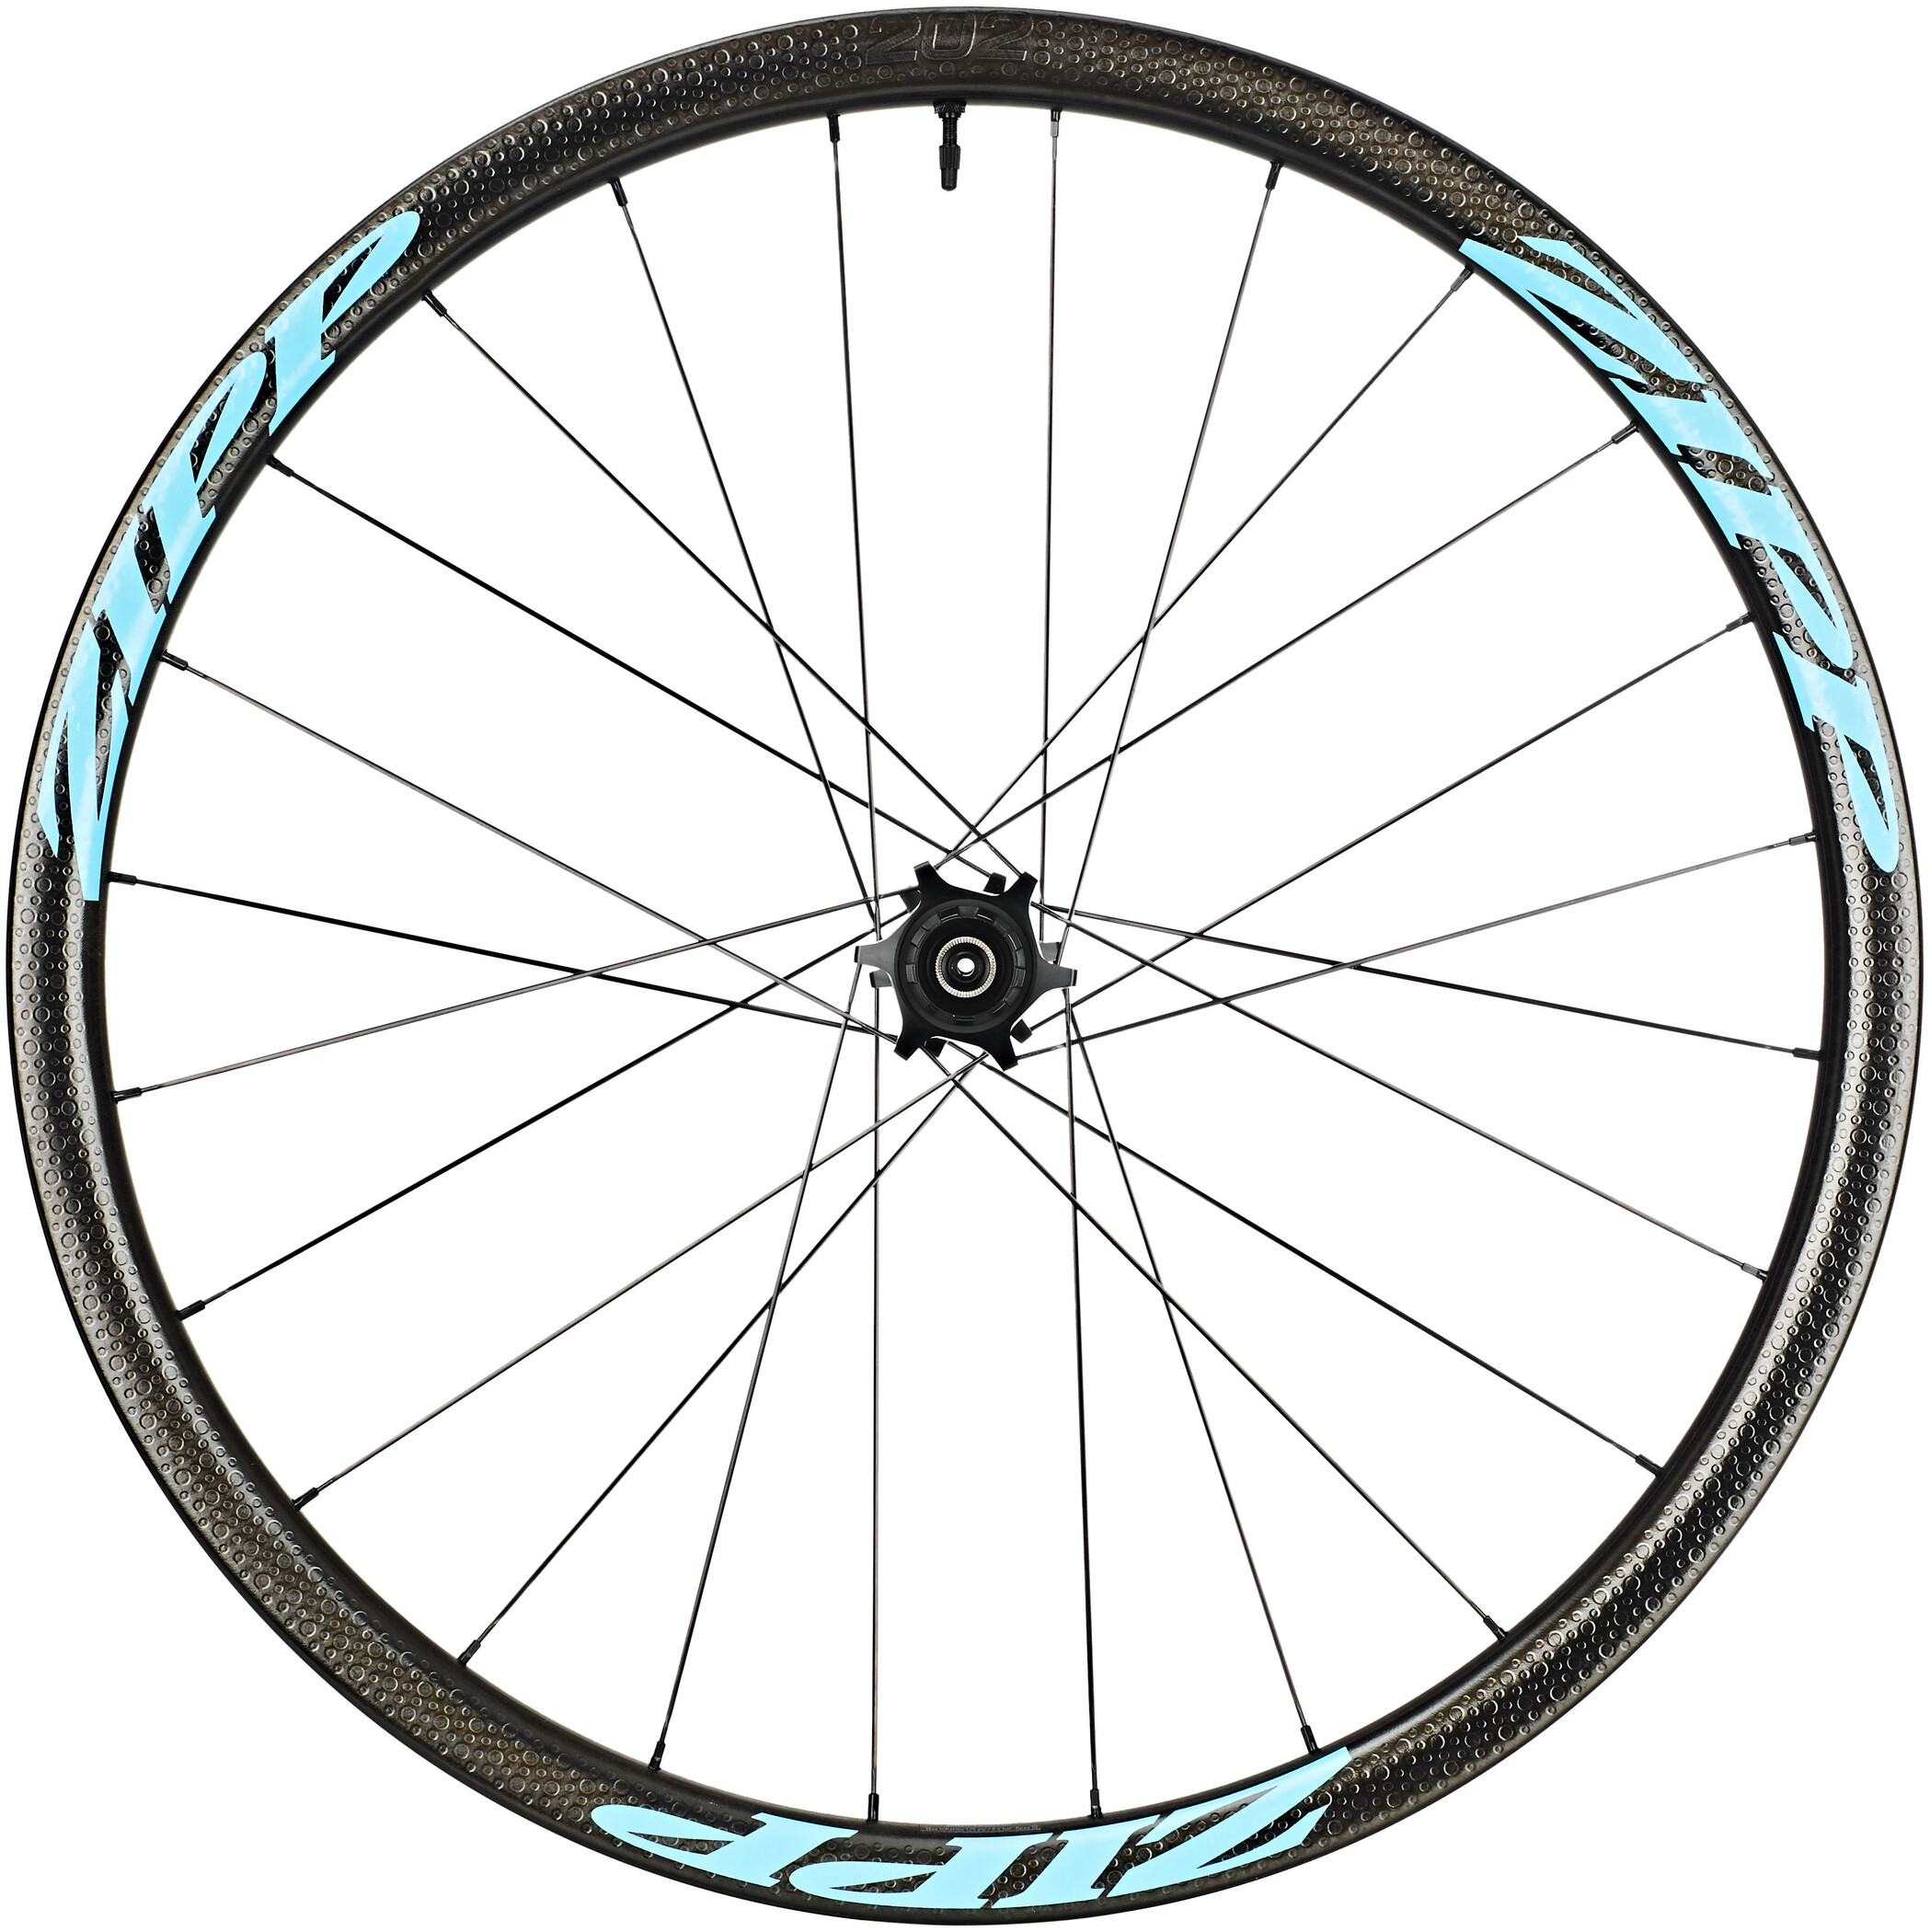 Zipp 202 Firecrest Tubeless Disc baghjul SRAM/Shimano, blue | Baghjul